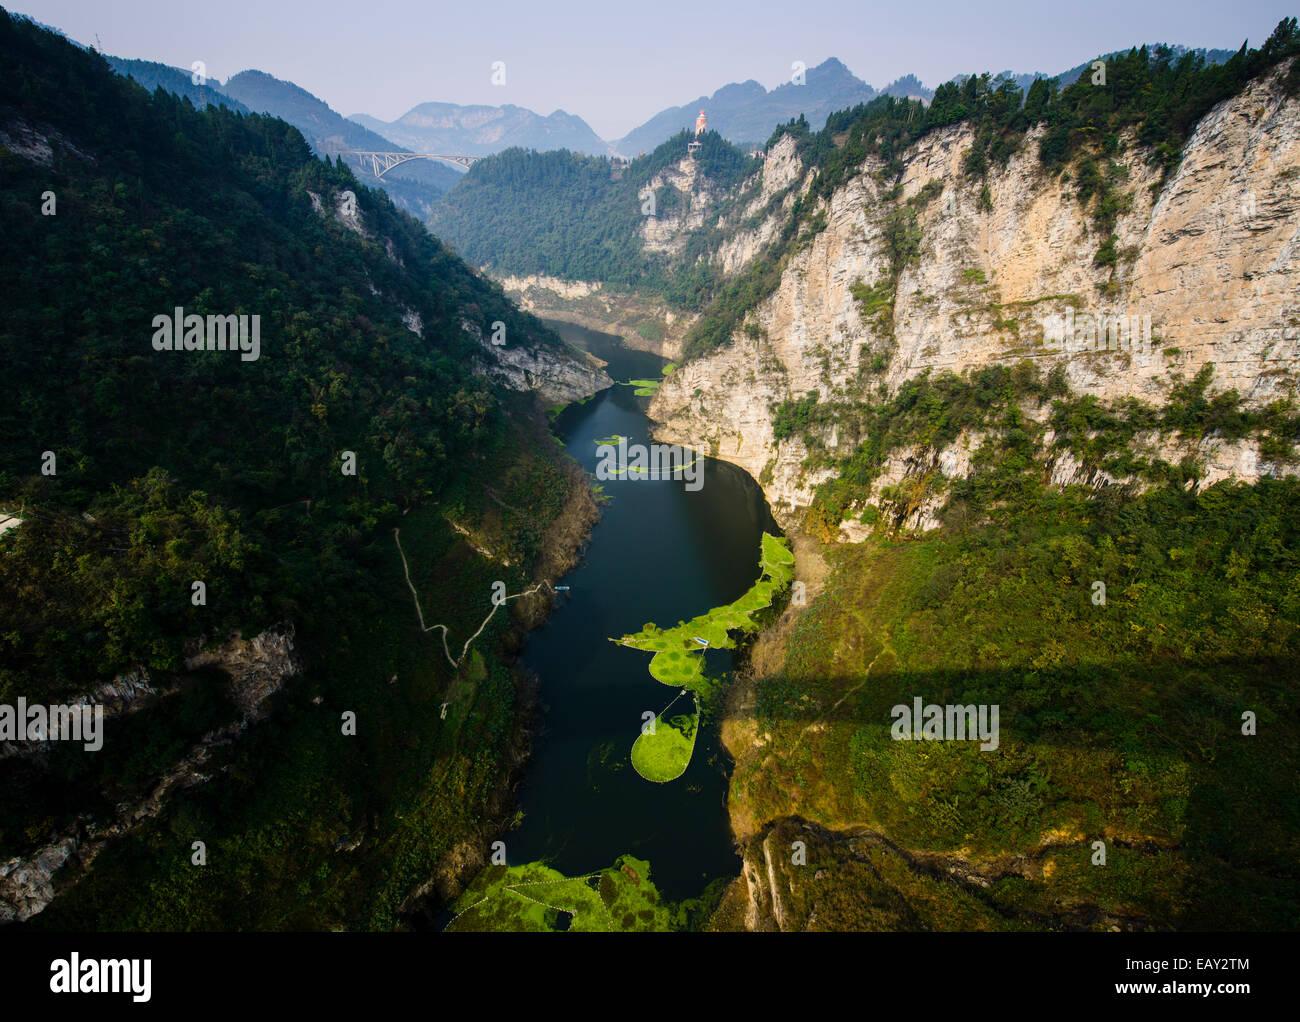 Bridge across the gorges of Guizhou province, China Stock Photo